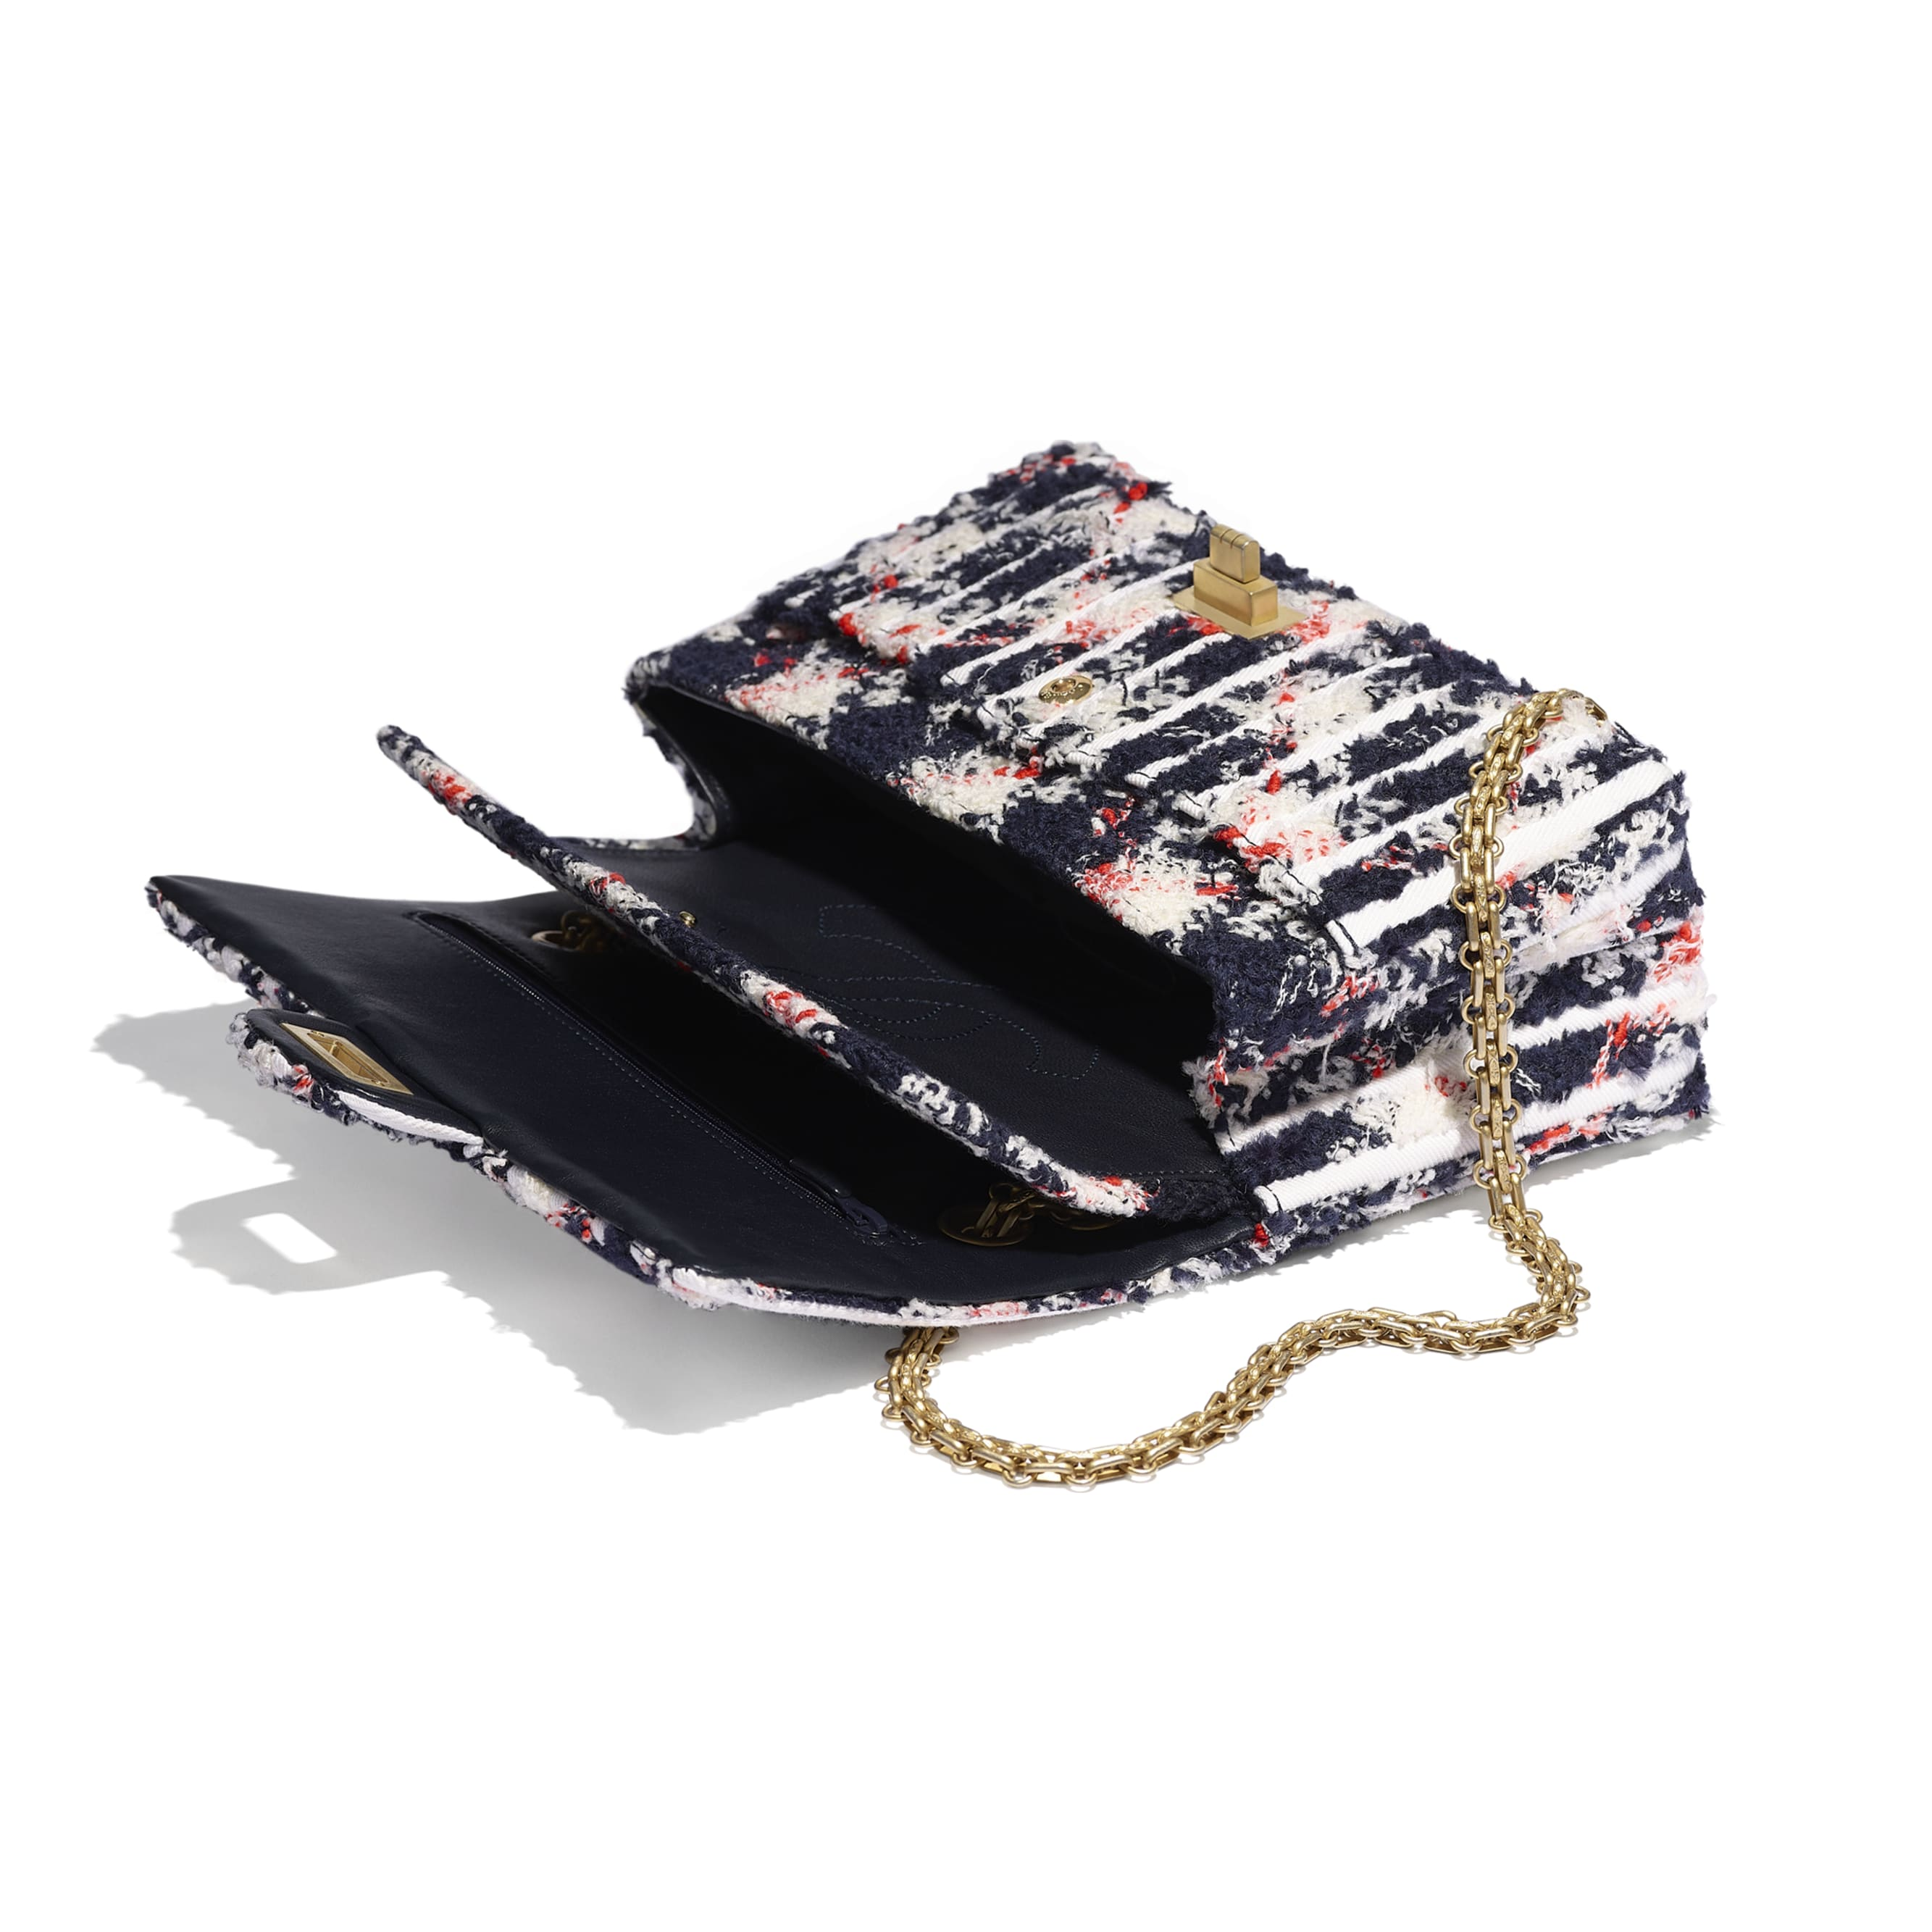 2.55 Handbag - Ecru, Navy Blue, Orange & White - Wool Tweed, Denim & Gold-Tone Metal - Other view - see standard sized version